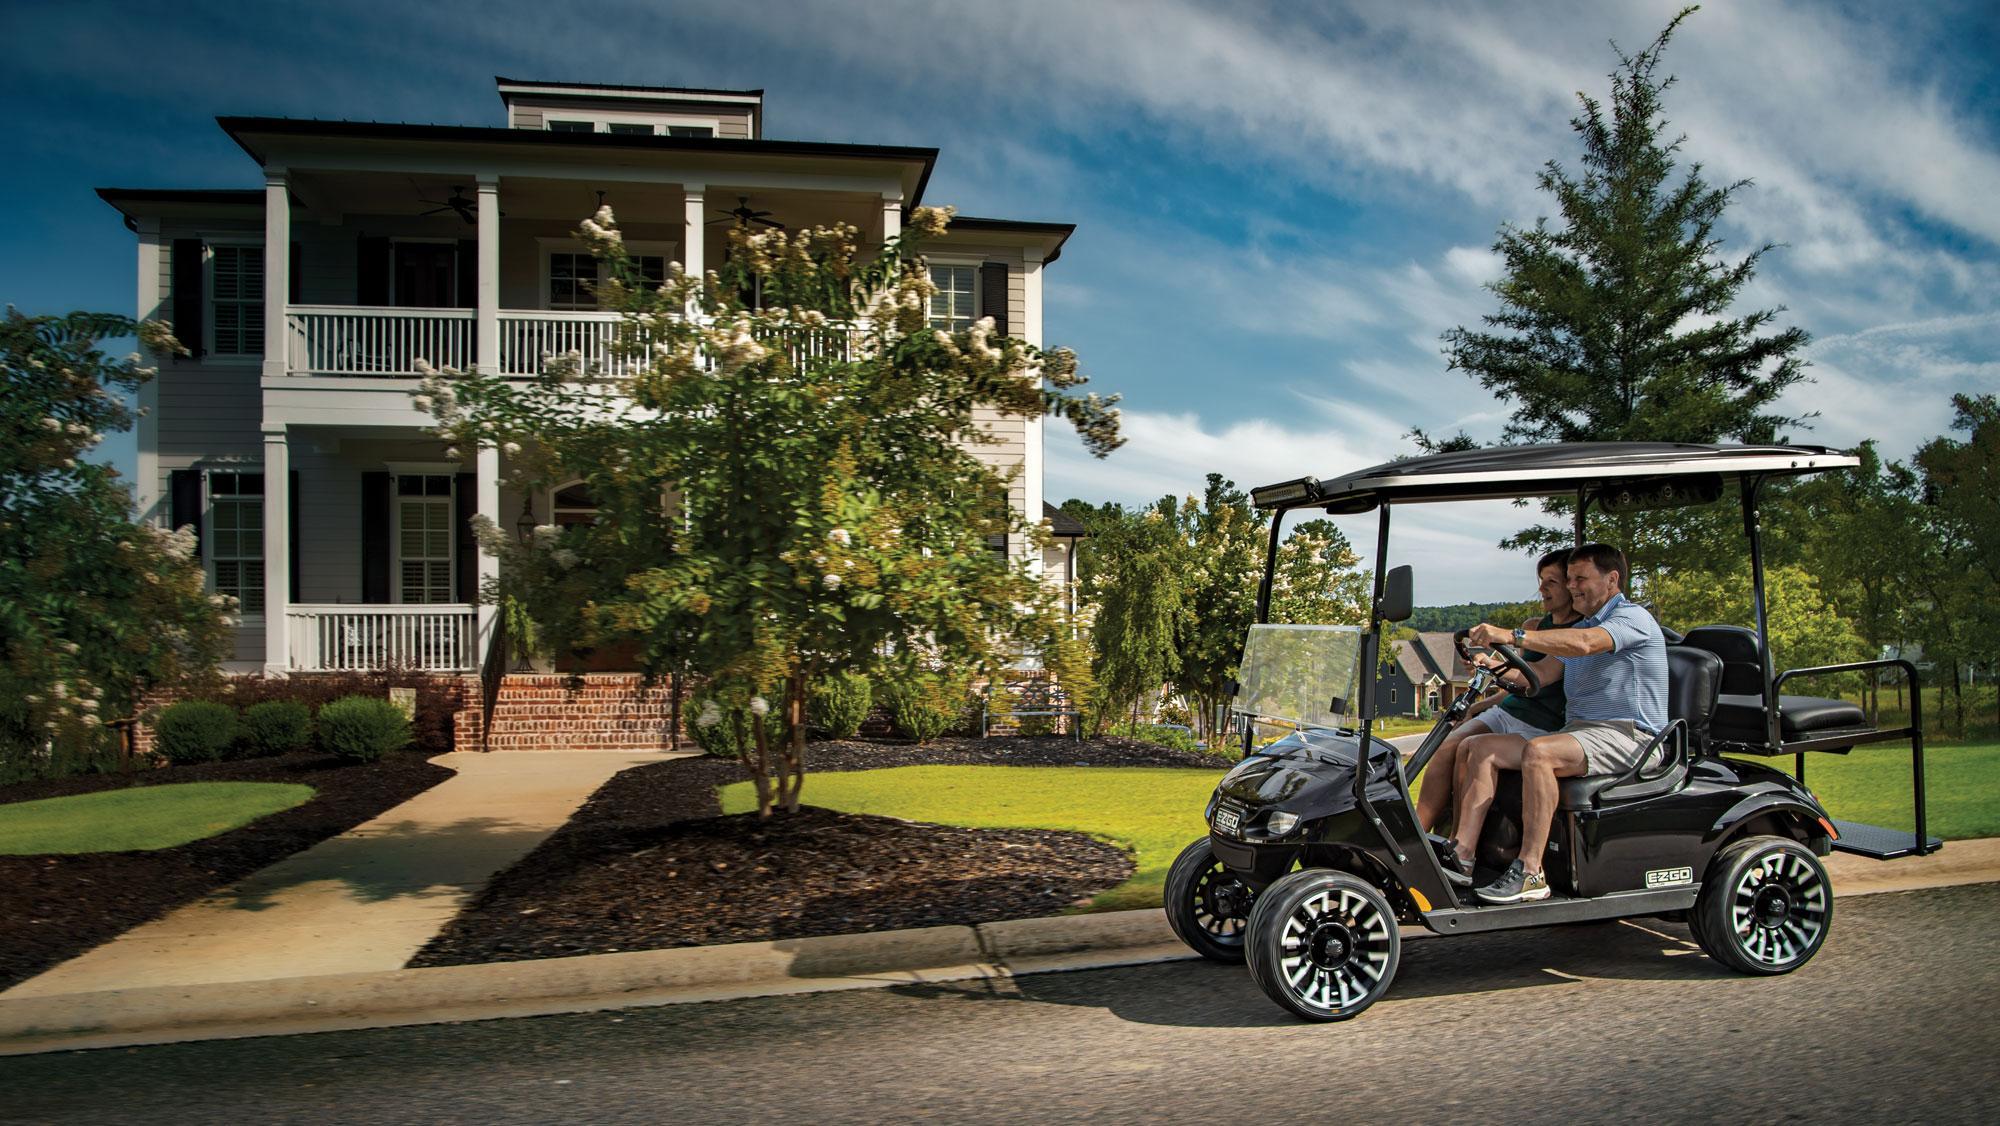 EZGO EX1 Gas Golf Cart Black Valor Driving